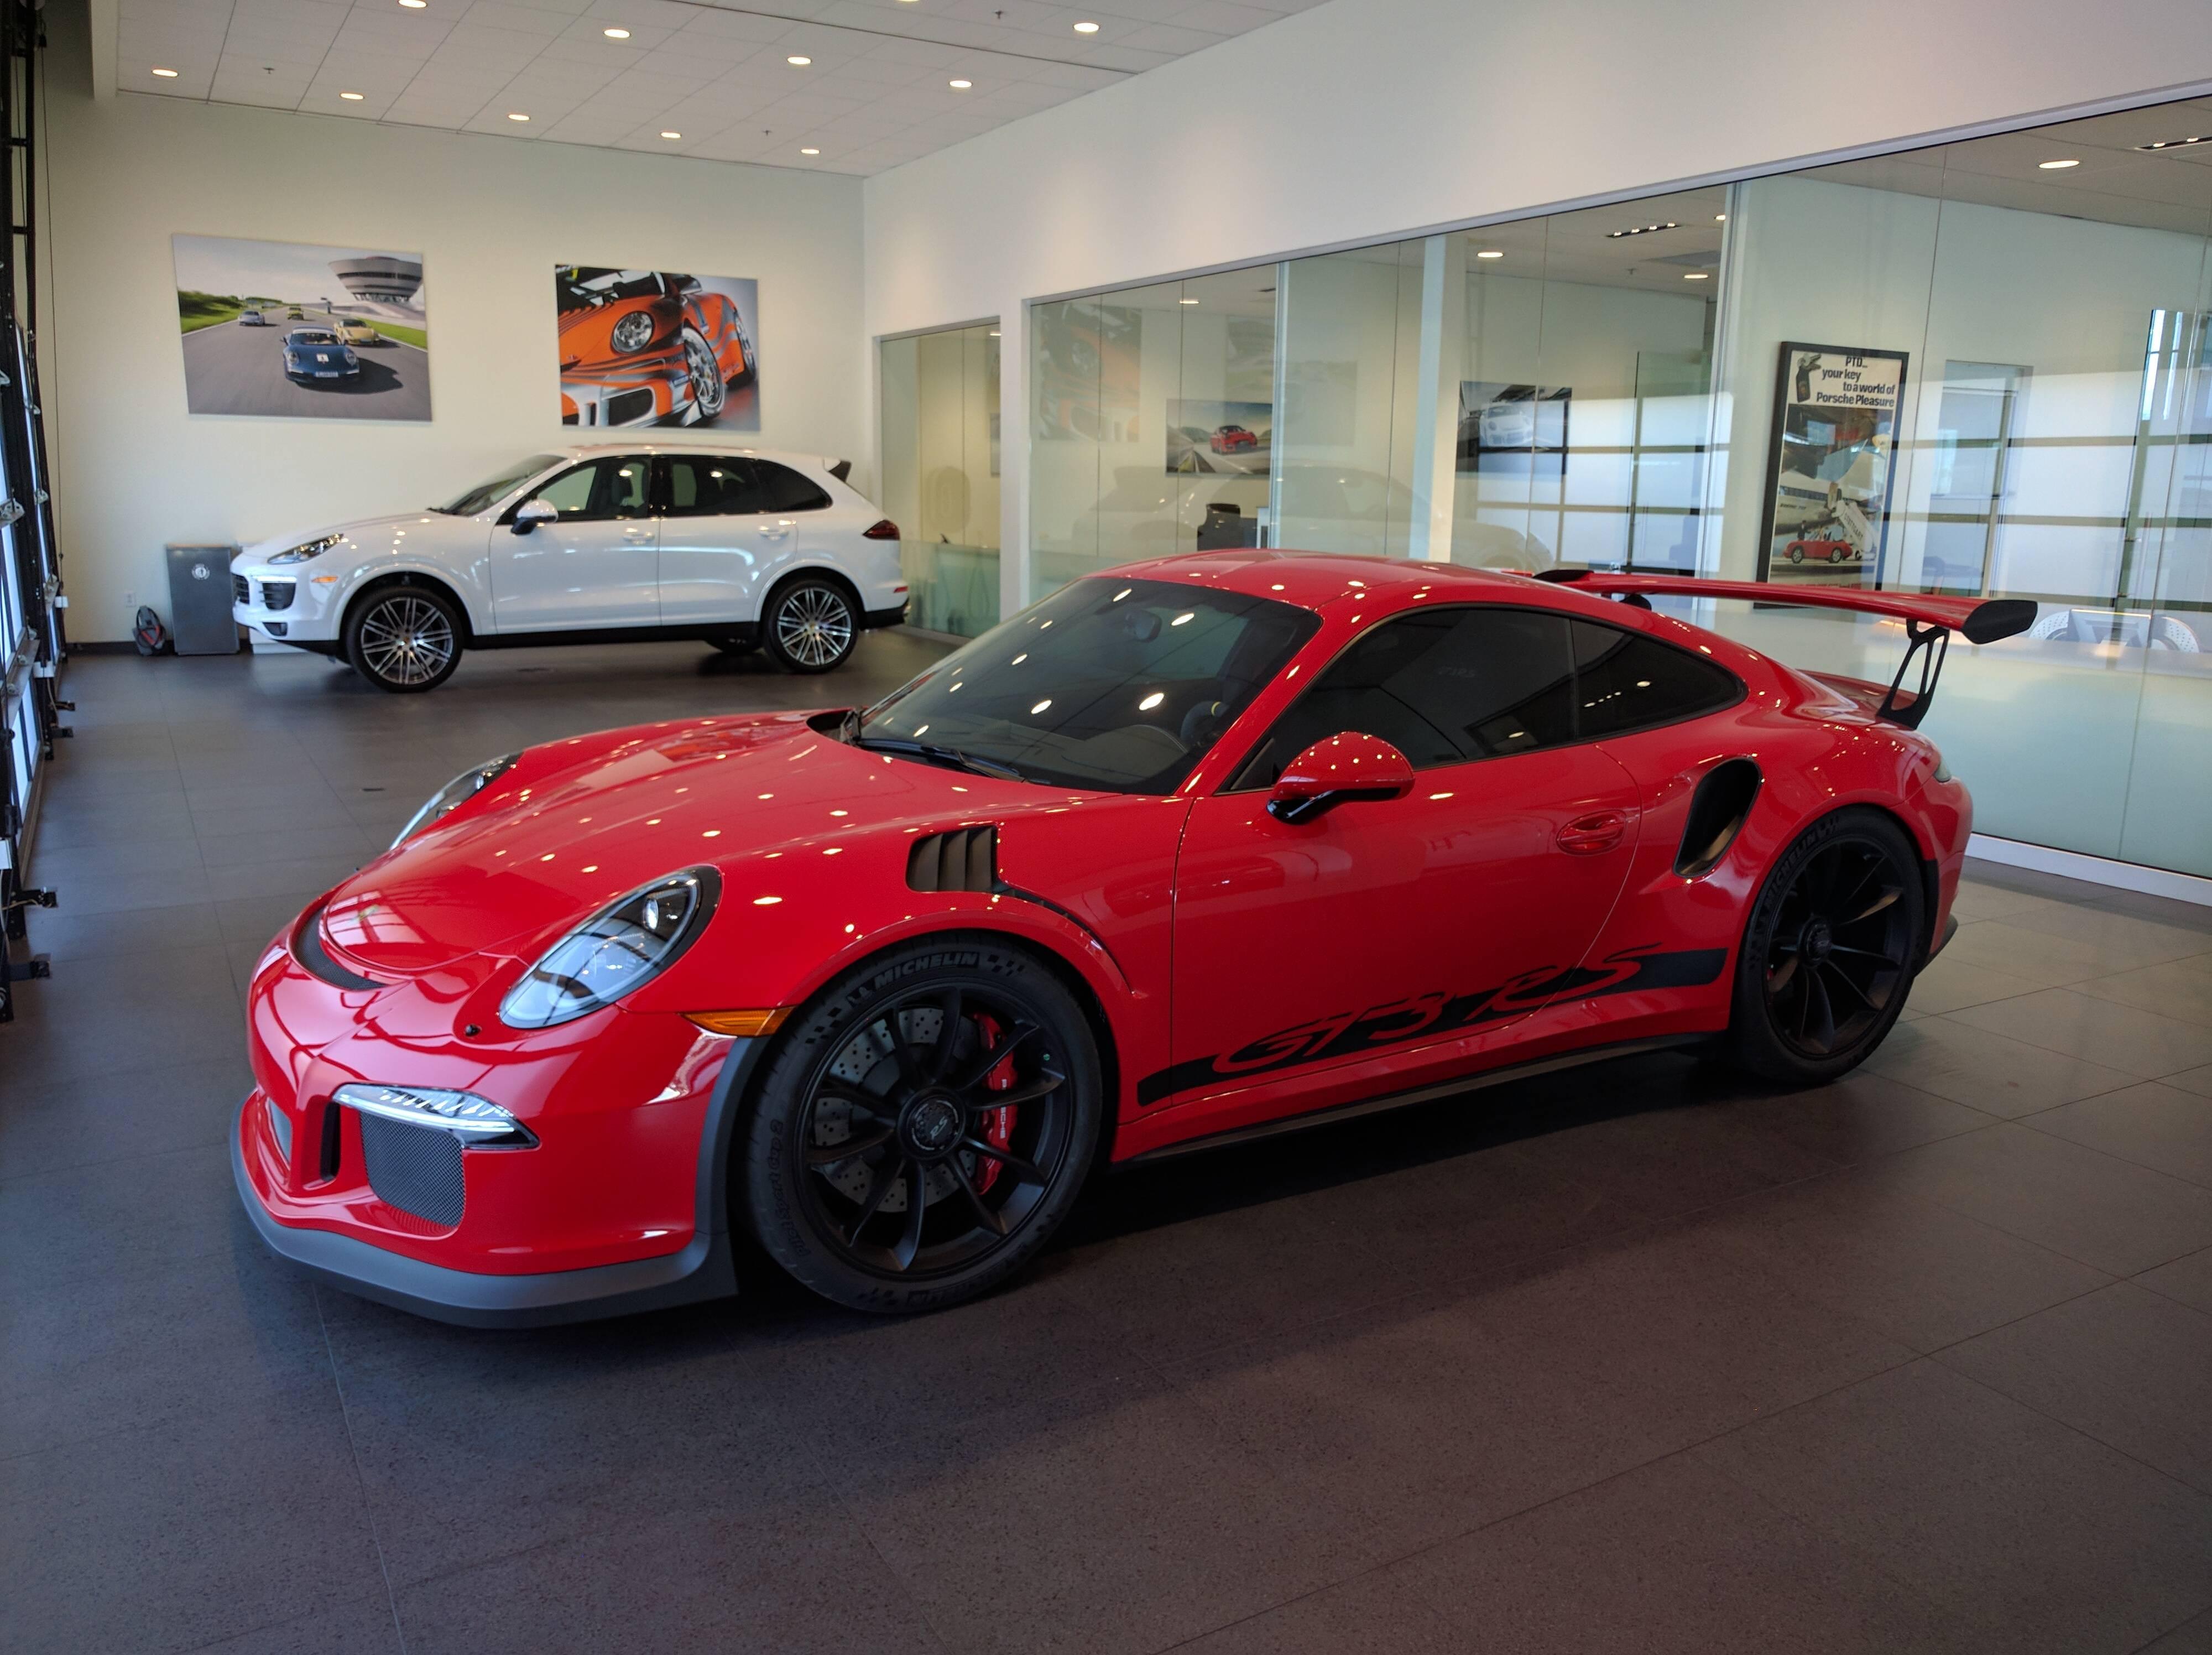 porsche 911 gt3 rs dressed in ferrari rosso corsa is supercar trolling genius autoevolution. Black Bedroom Furniture Sets. Home Design Ideas